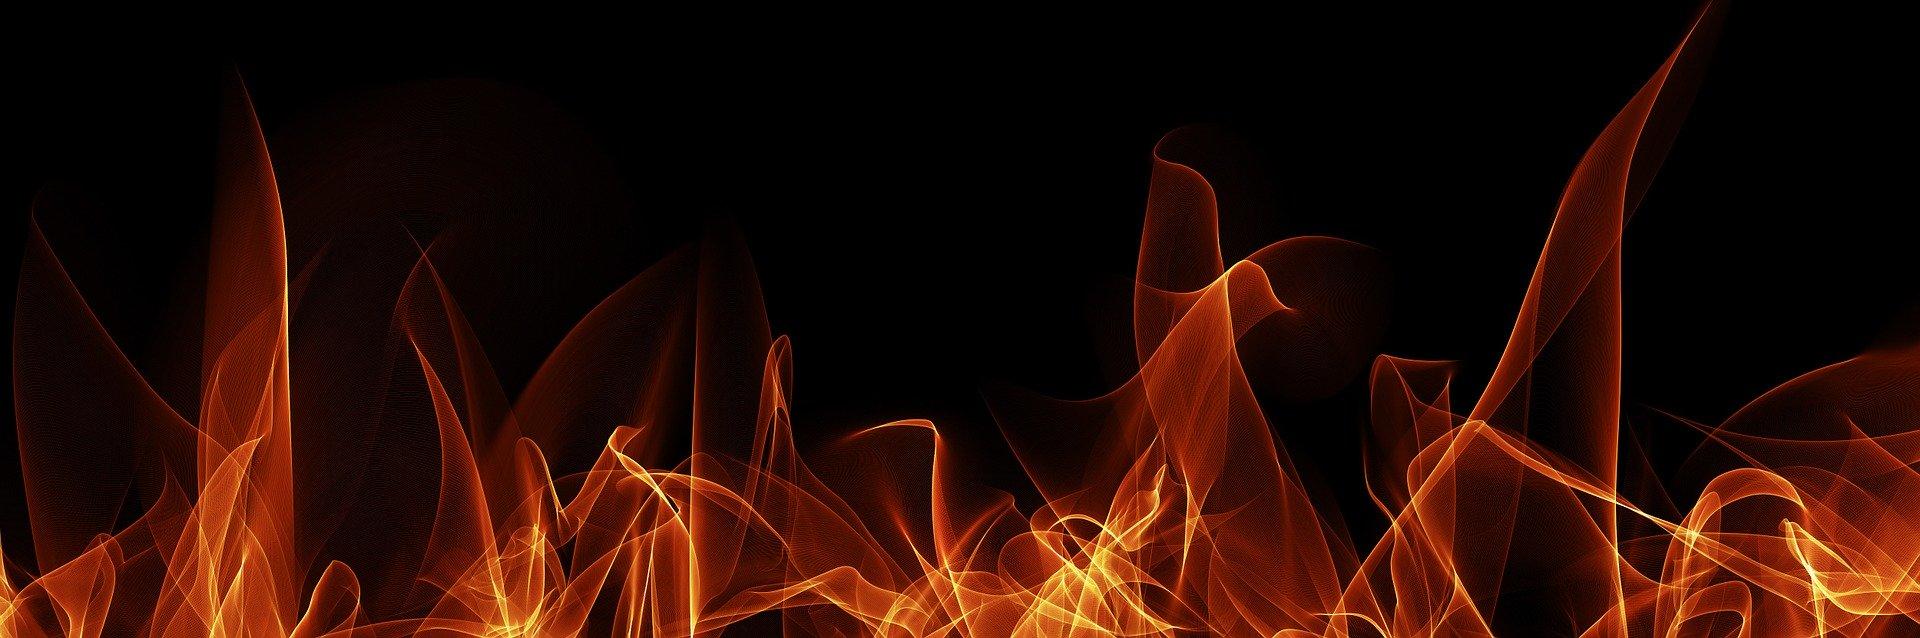 flame-1345507_1920